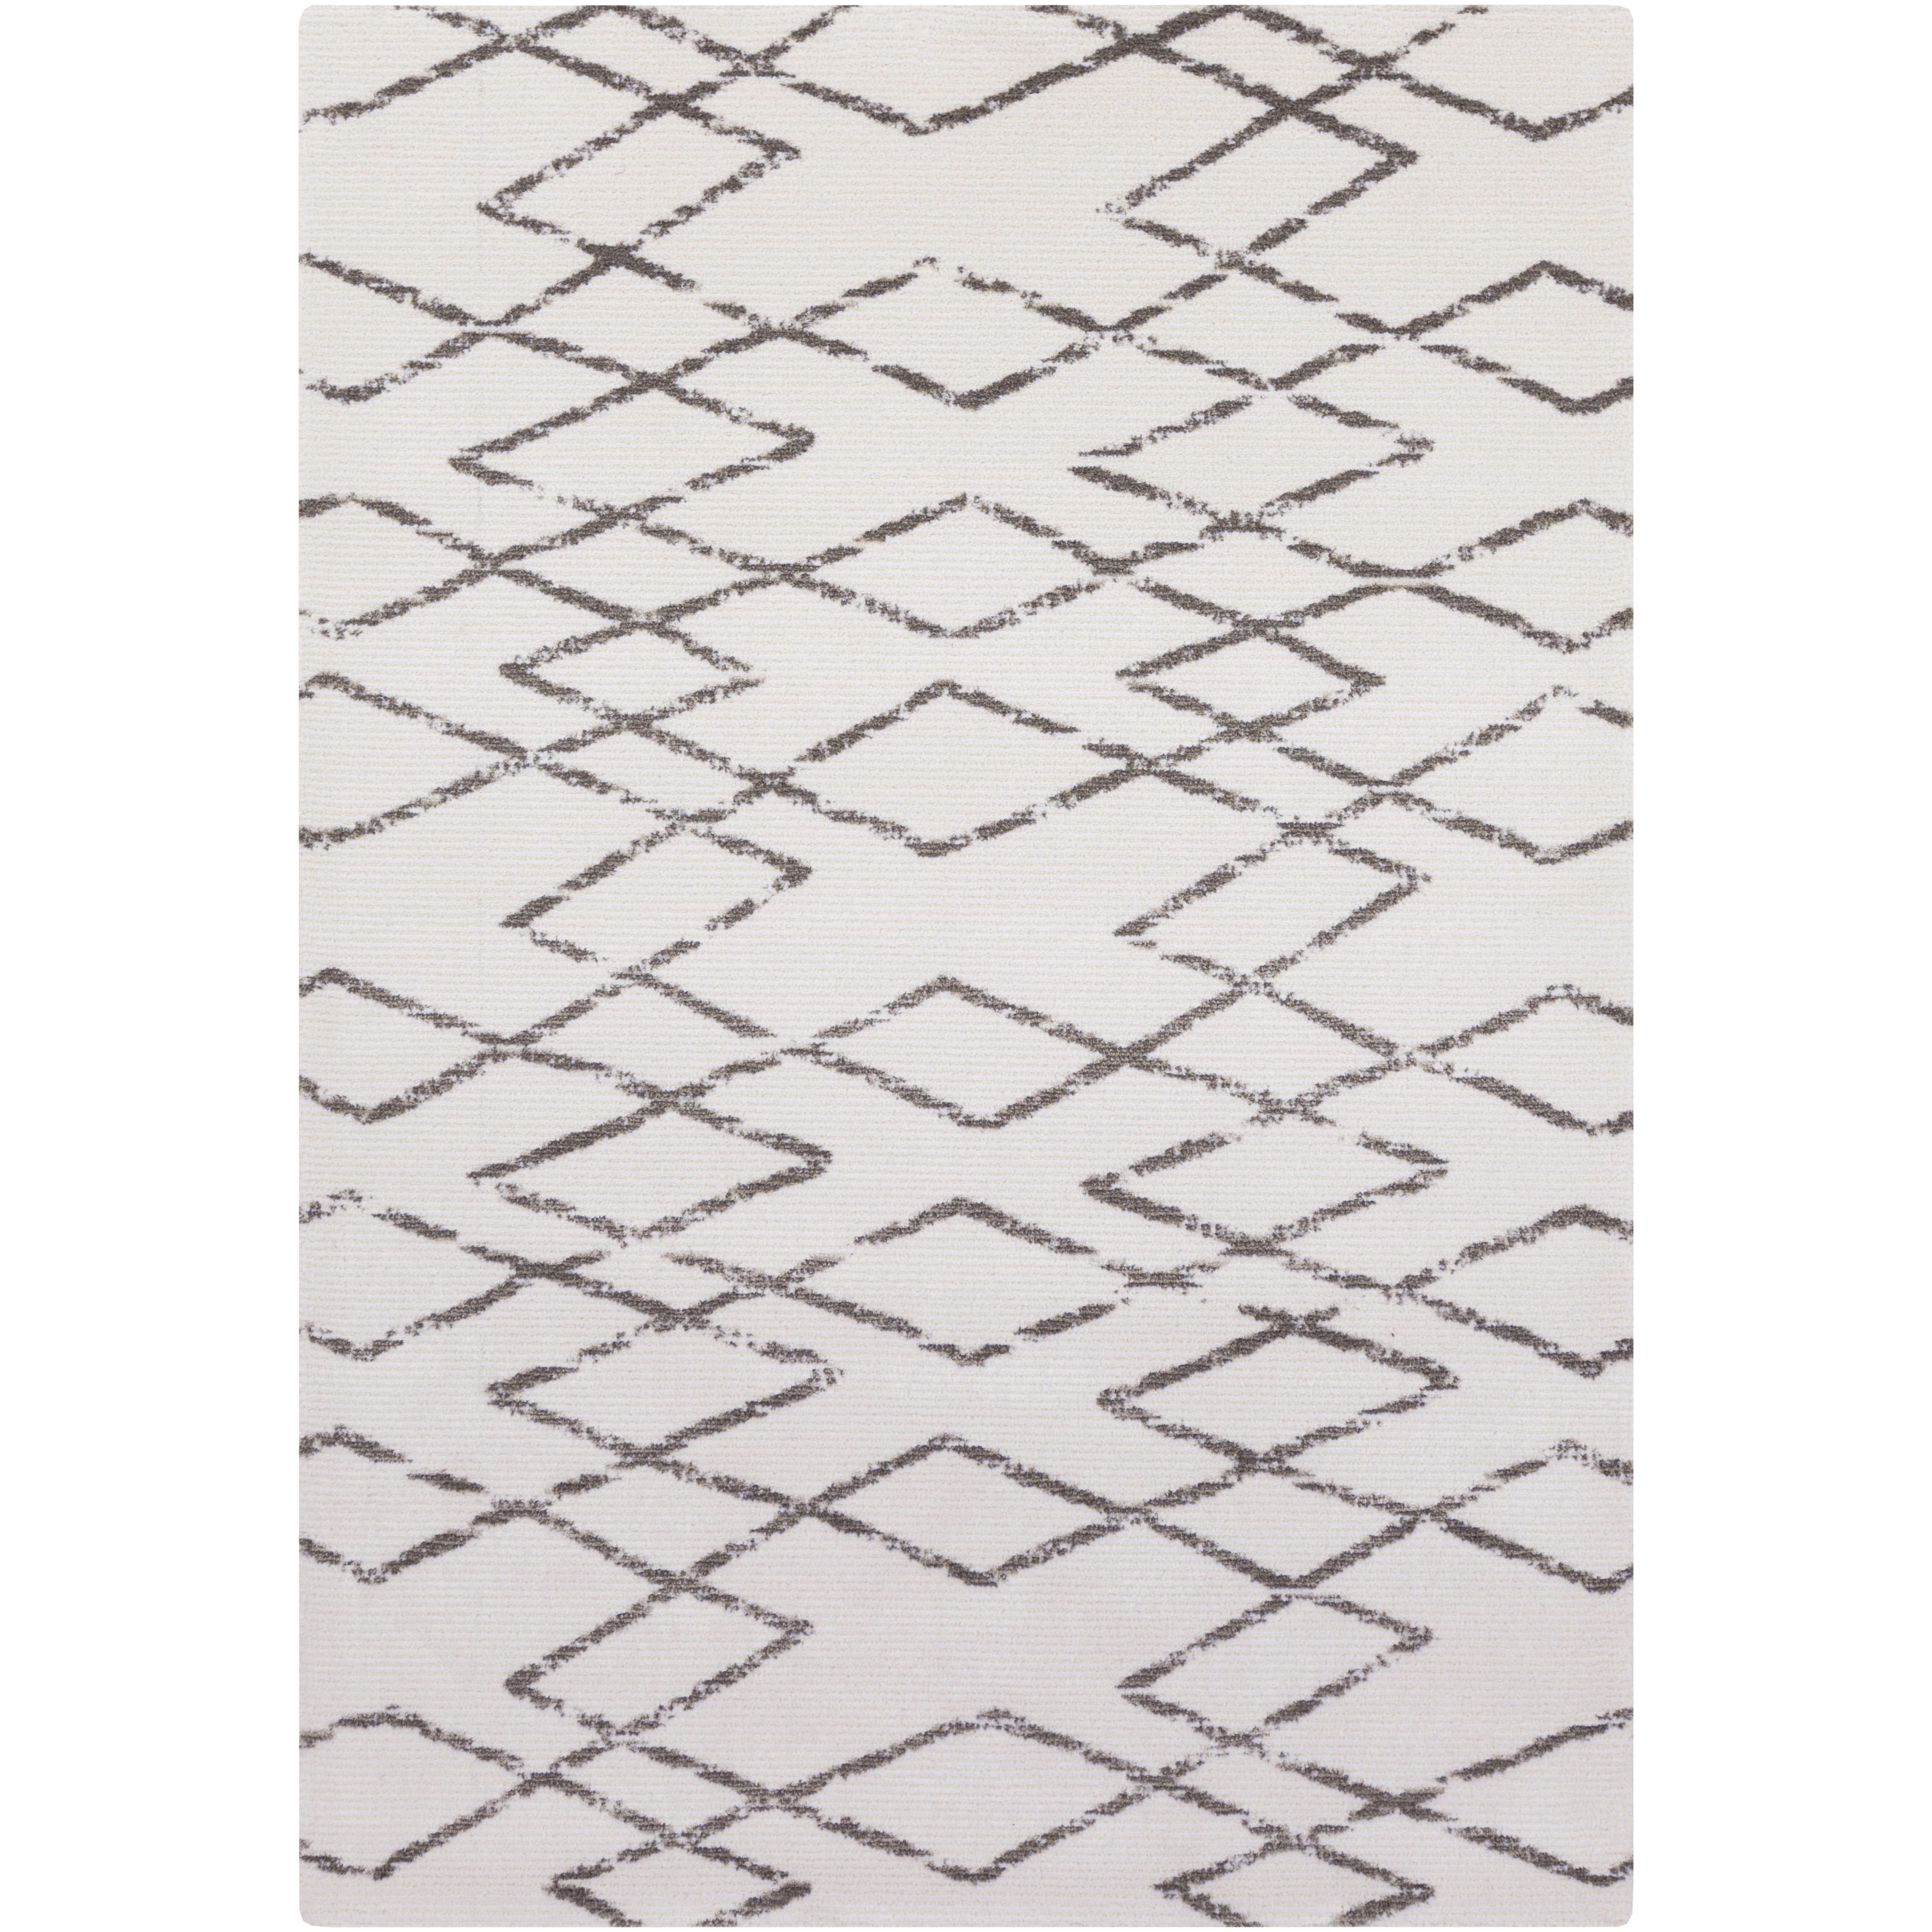 Perla 8' x 10' by 9596 at Becker Furniture